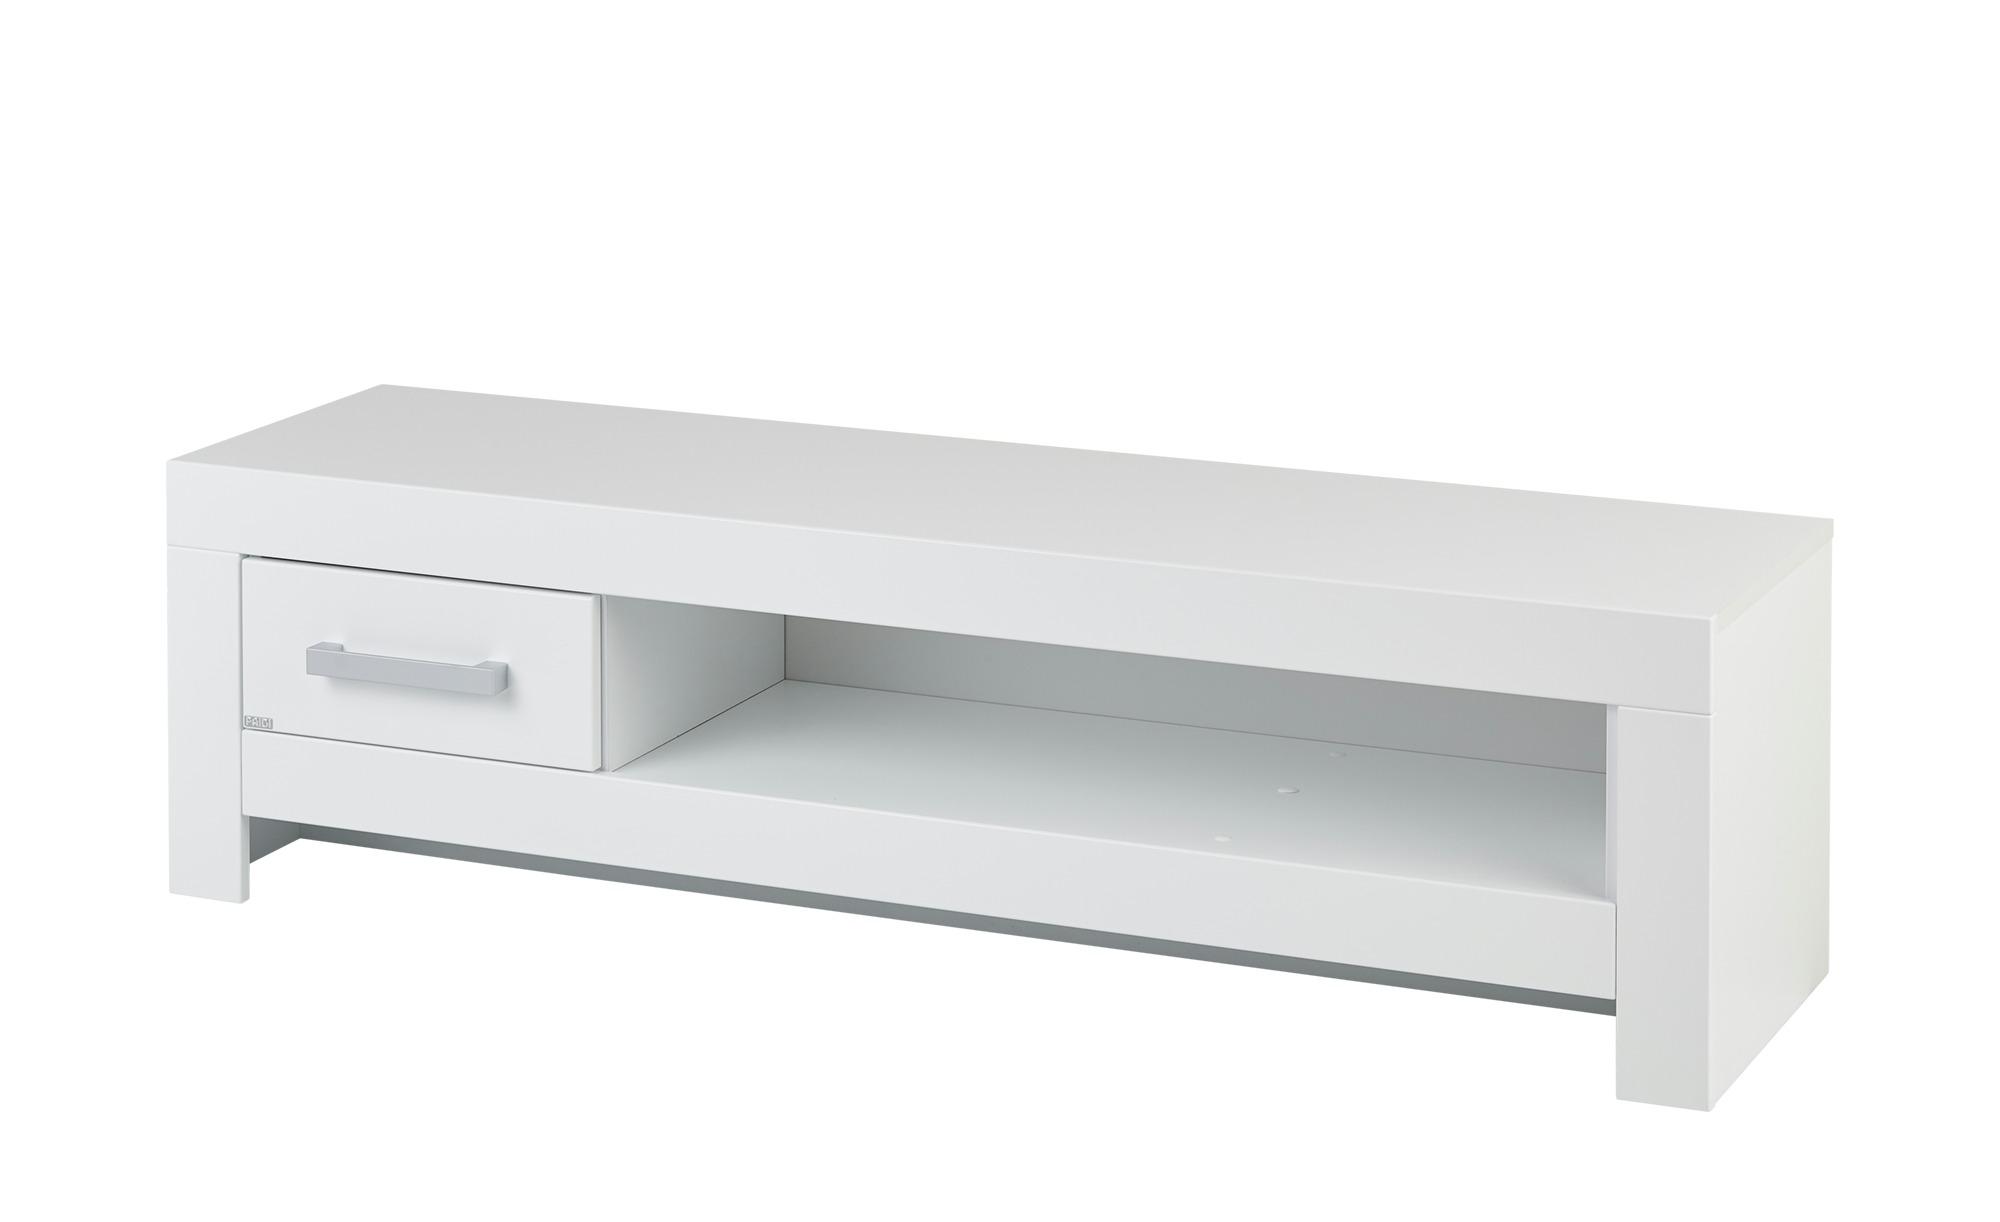 PAIDI TV-Lowboard  Fiona ¦ weiß ¦ Maße (cm): B: 147,2 H: 40,7 T: 39,3 Kommoden & Sideboards > Lowboards - Höffner